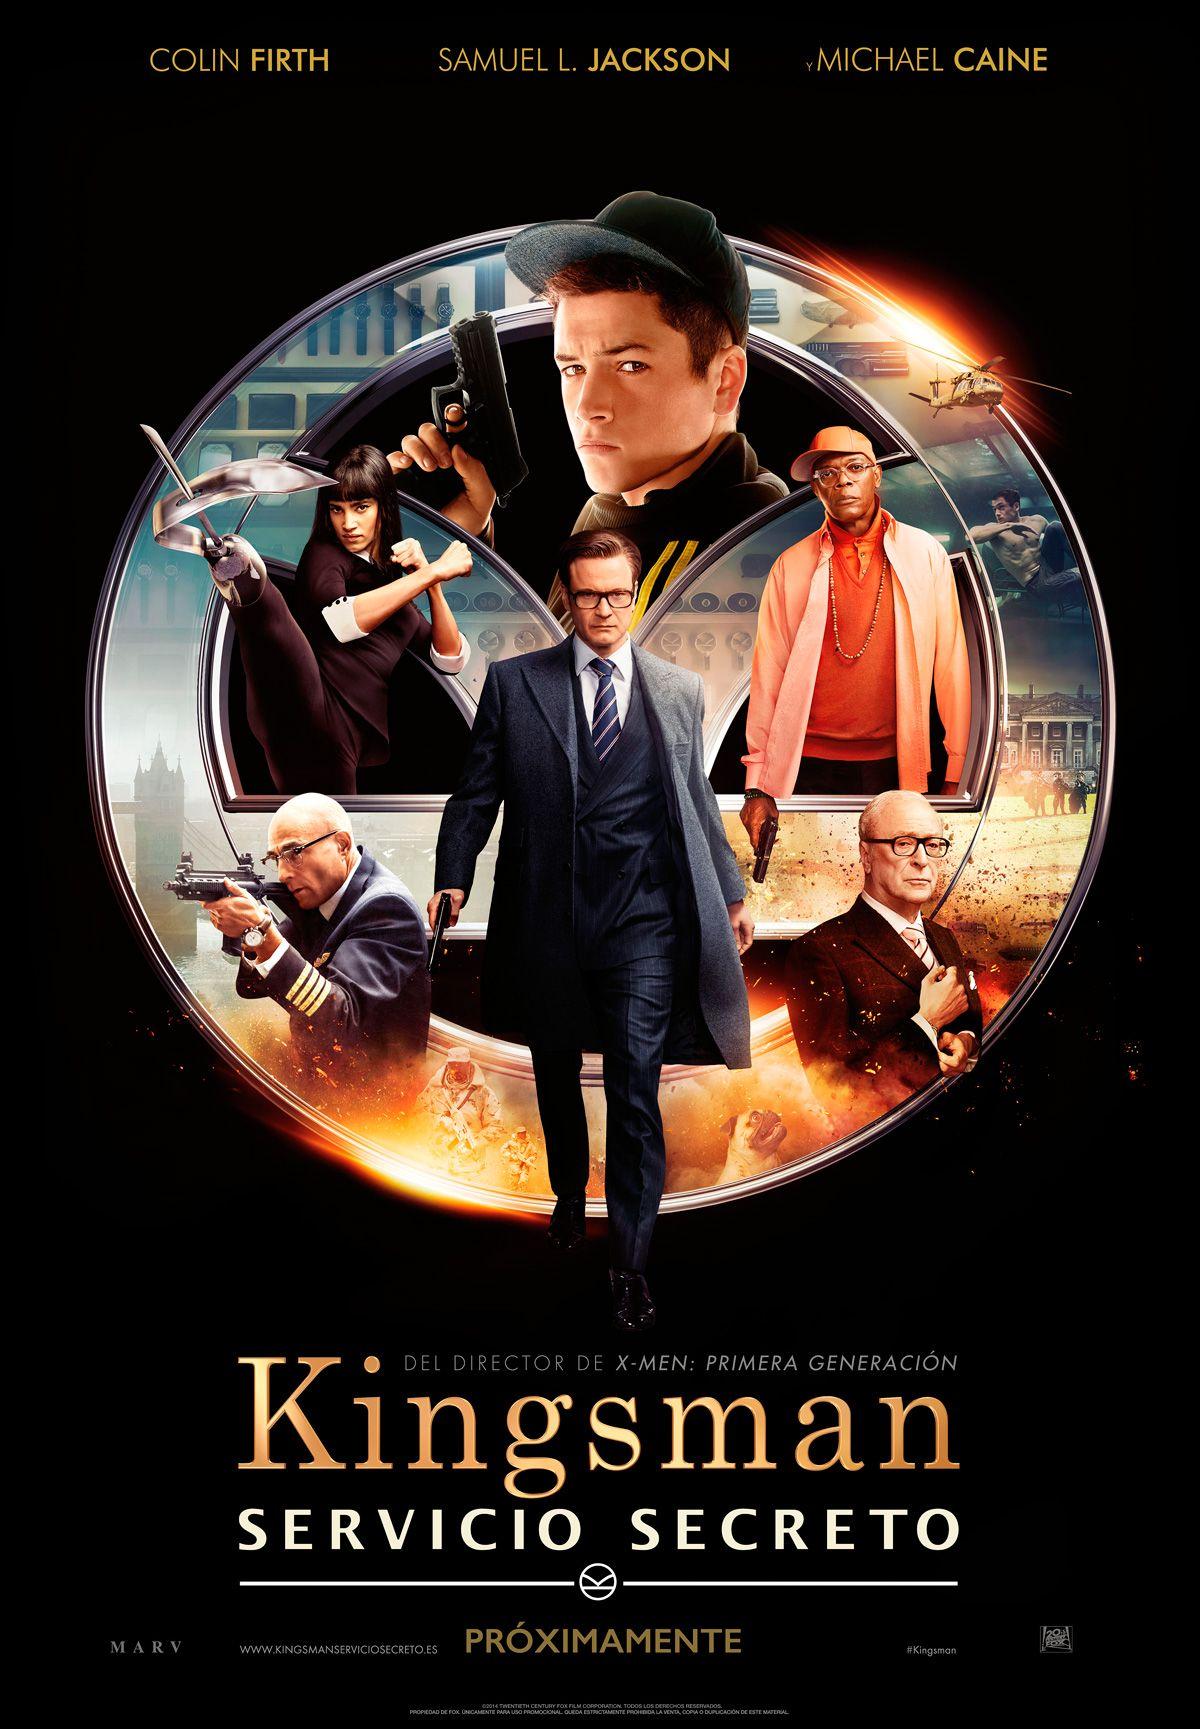 Gercomovies Venta De Películas Neiva Criticas De Cine Kingsman Carteleras De Cine